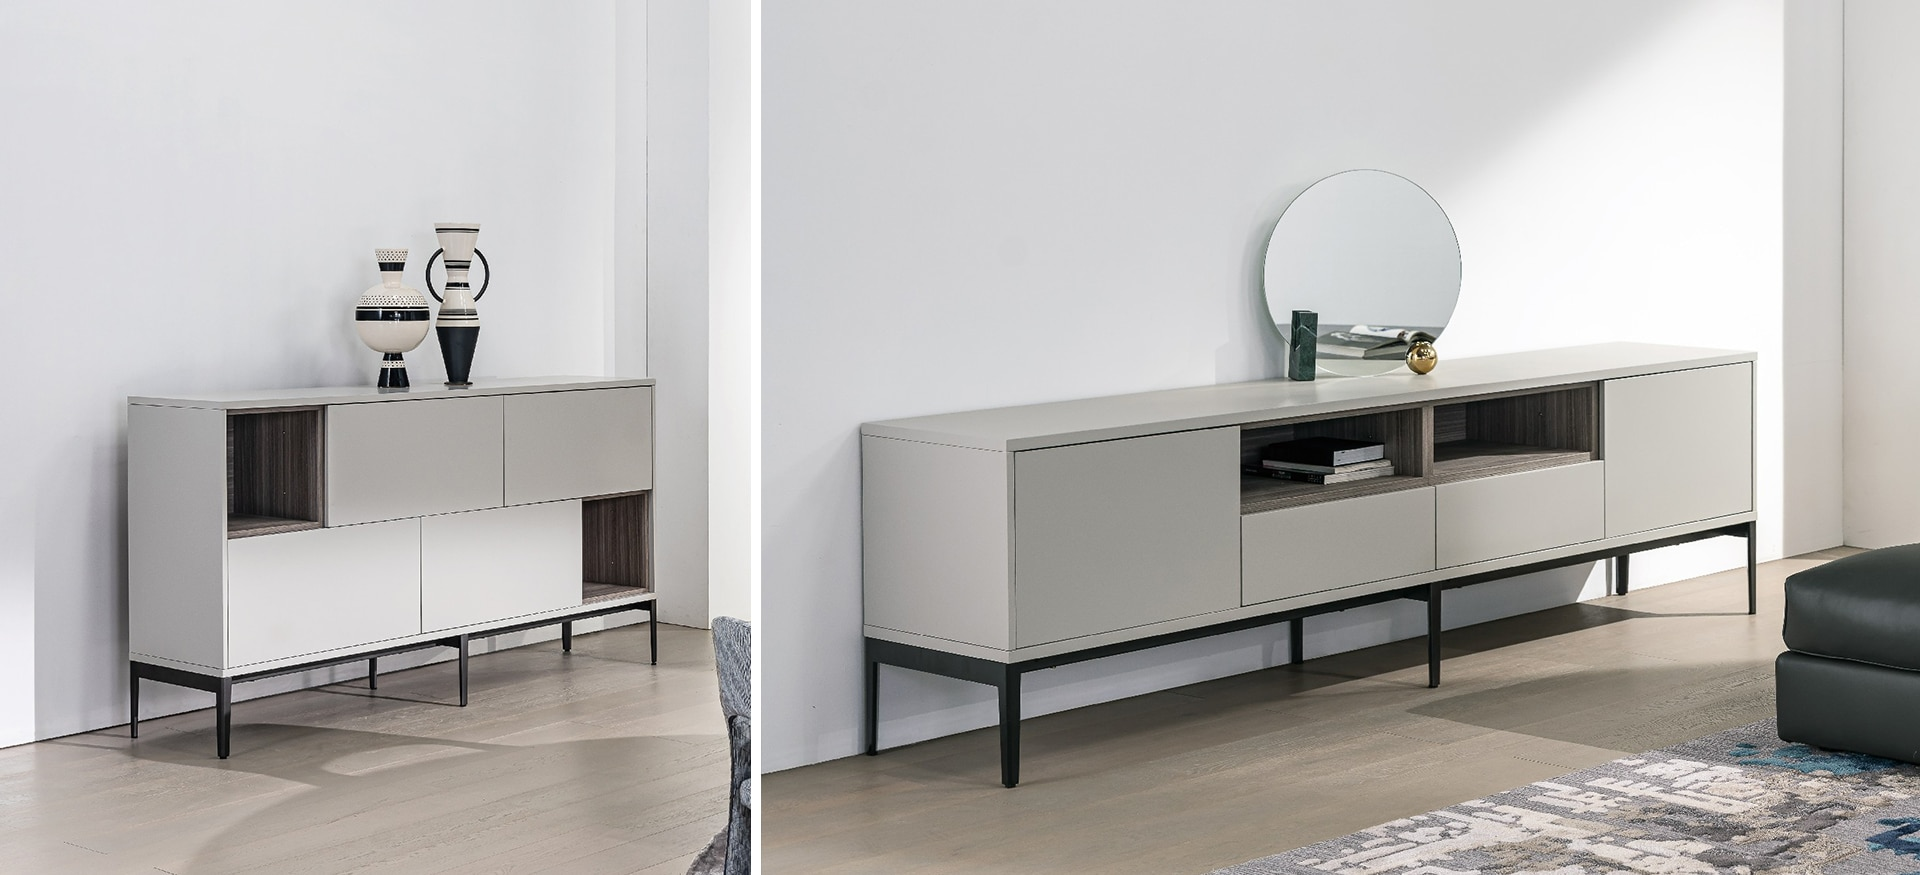 pixel cabinet